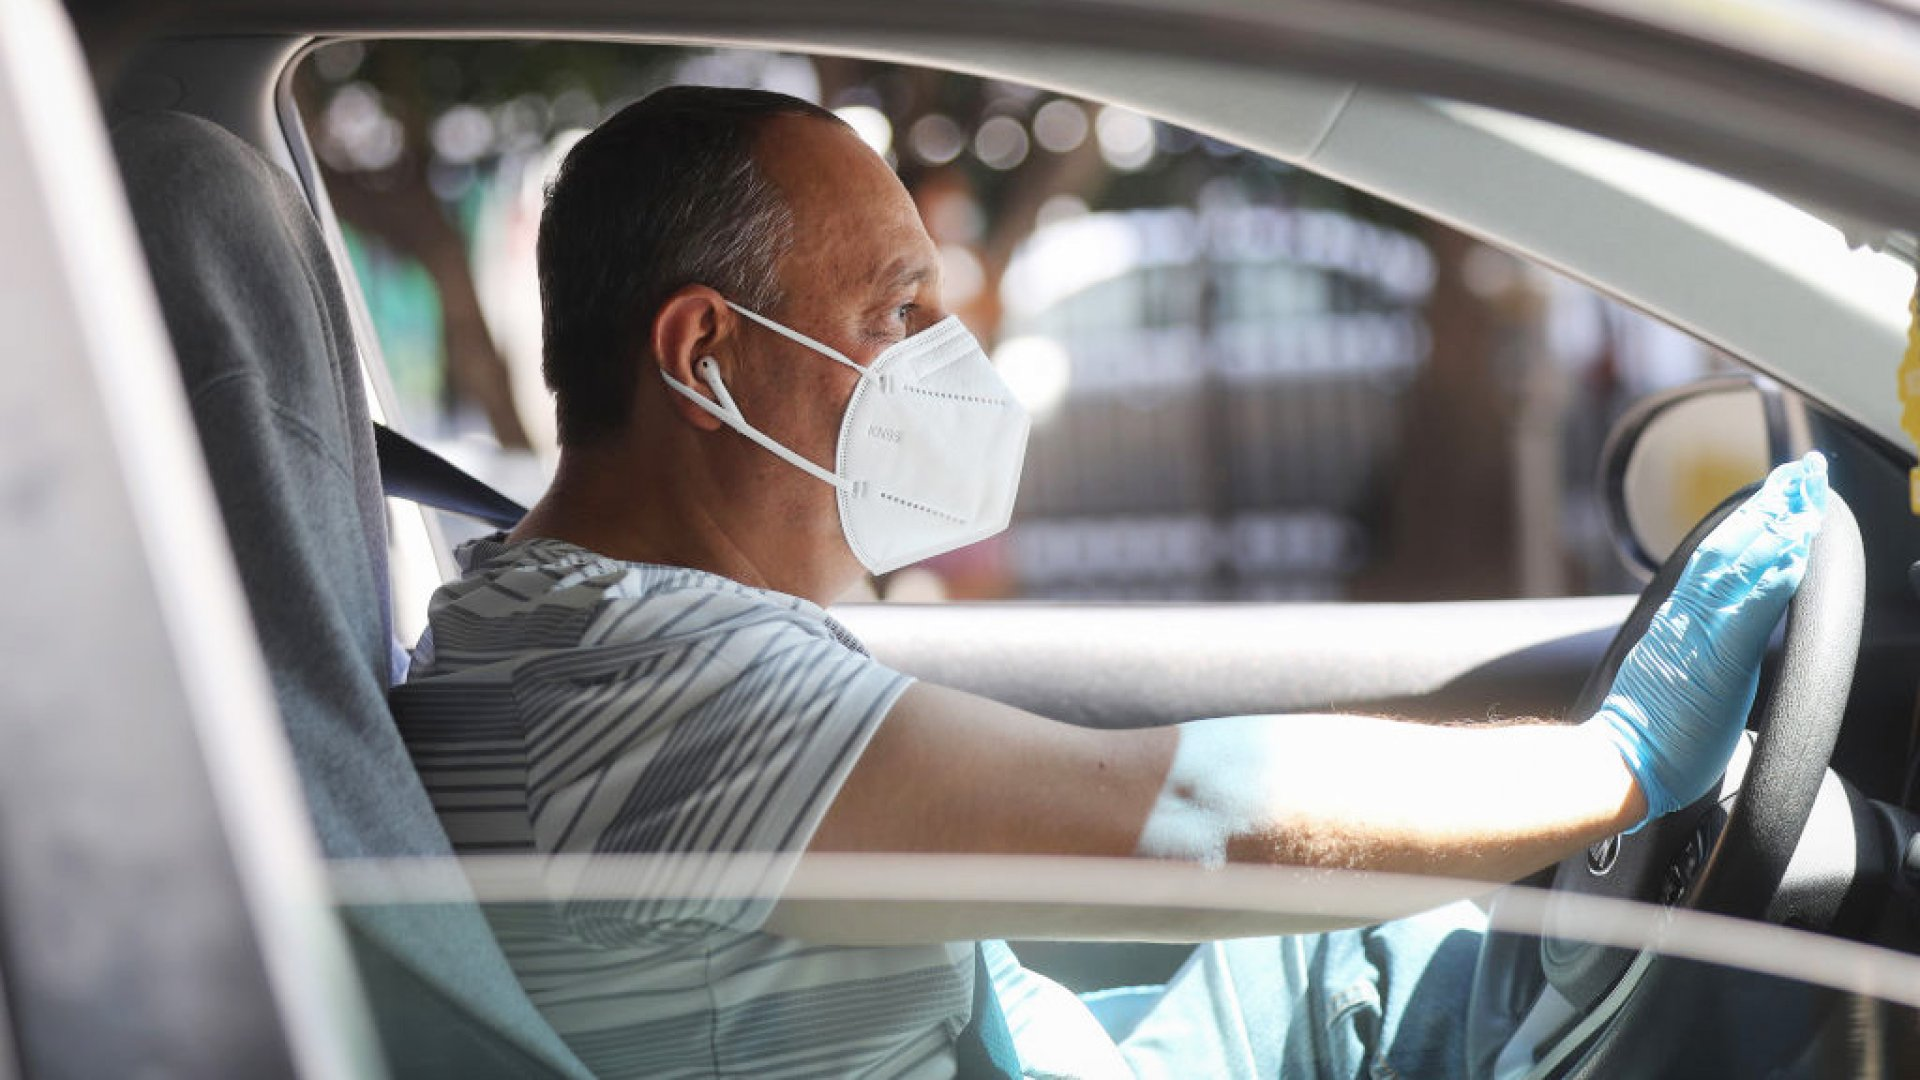 How Uber Rides Are Changing in Response to Coronavirus